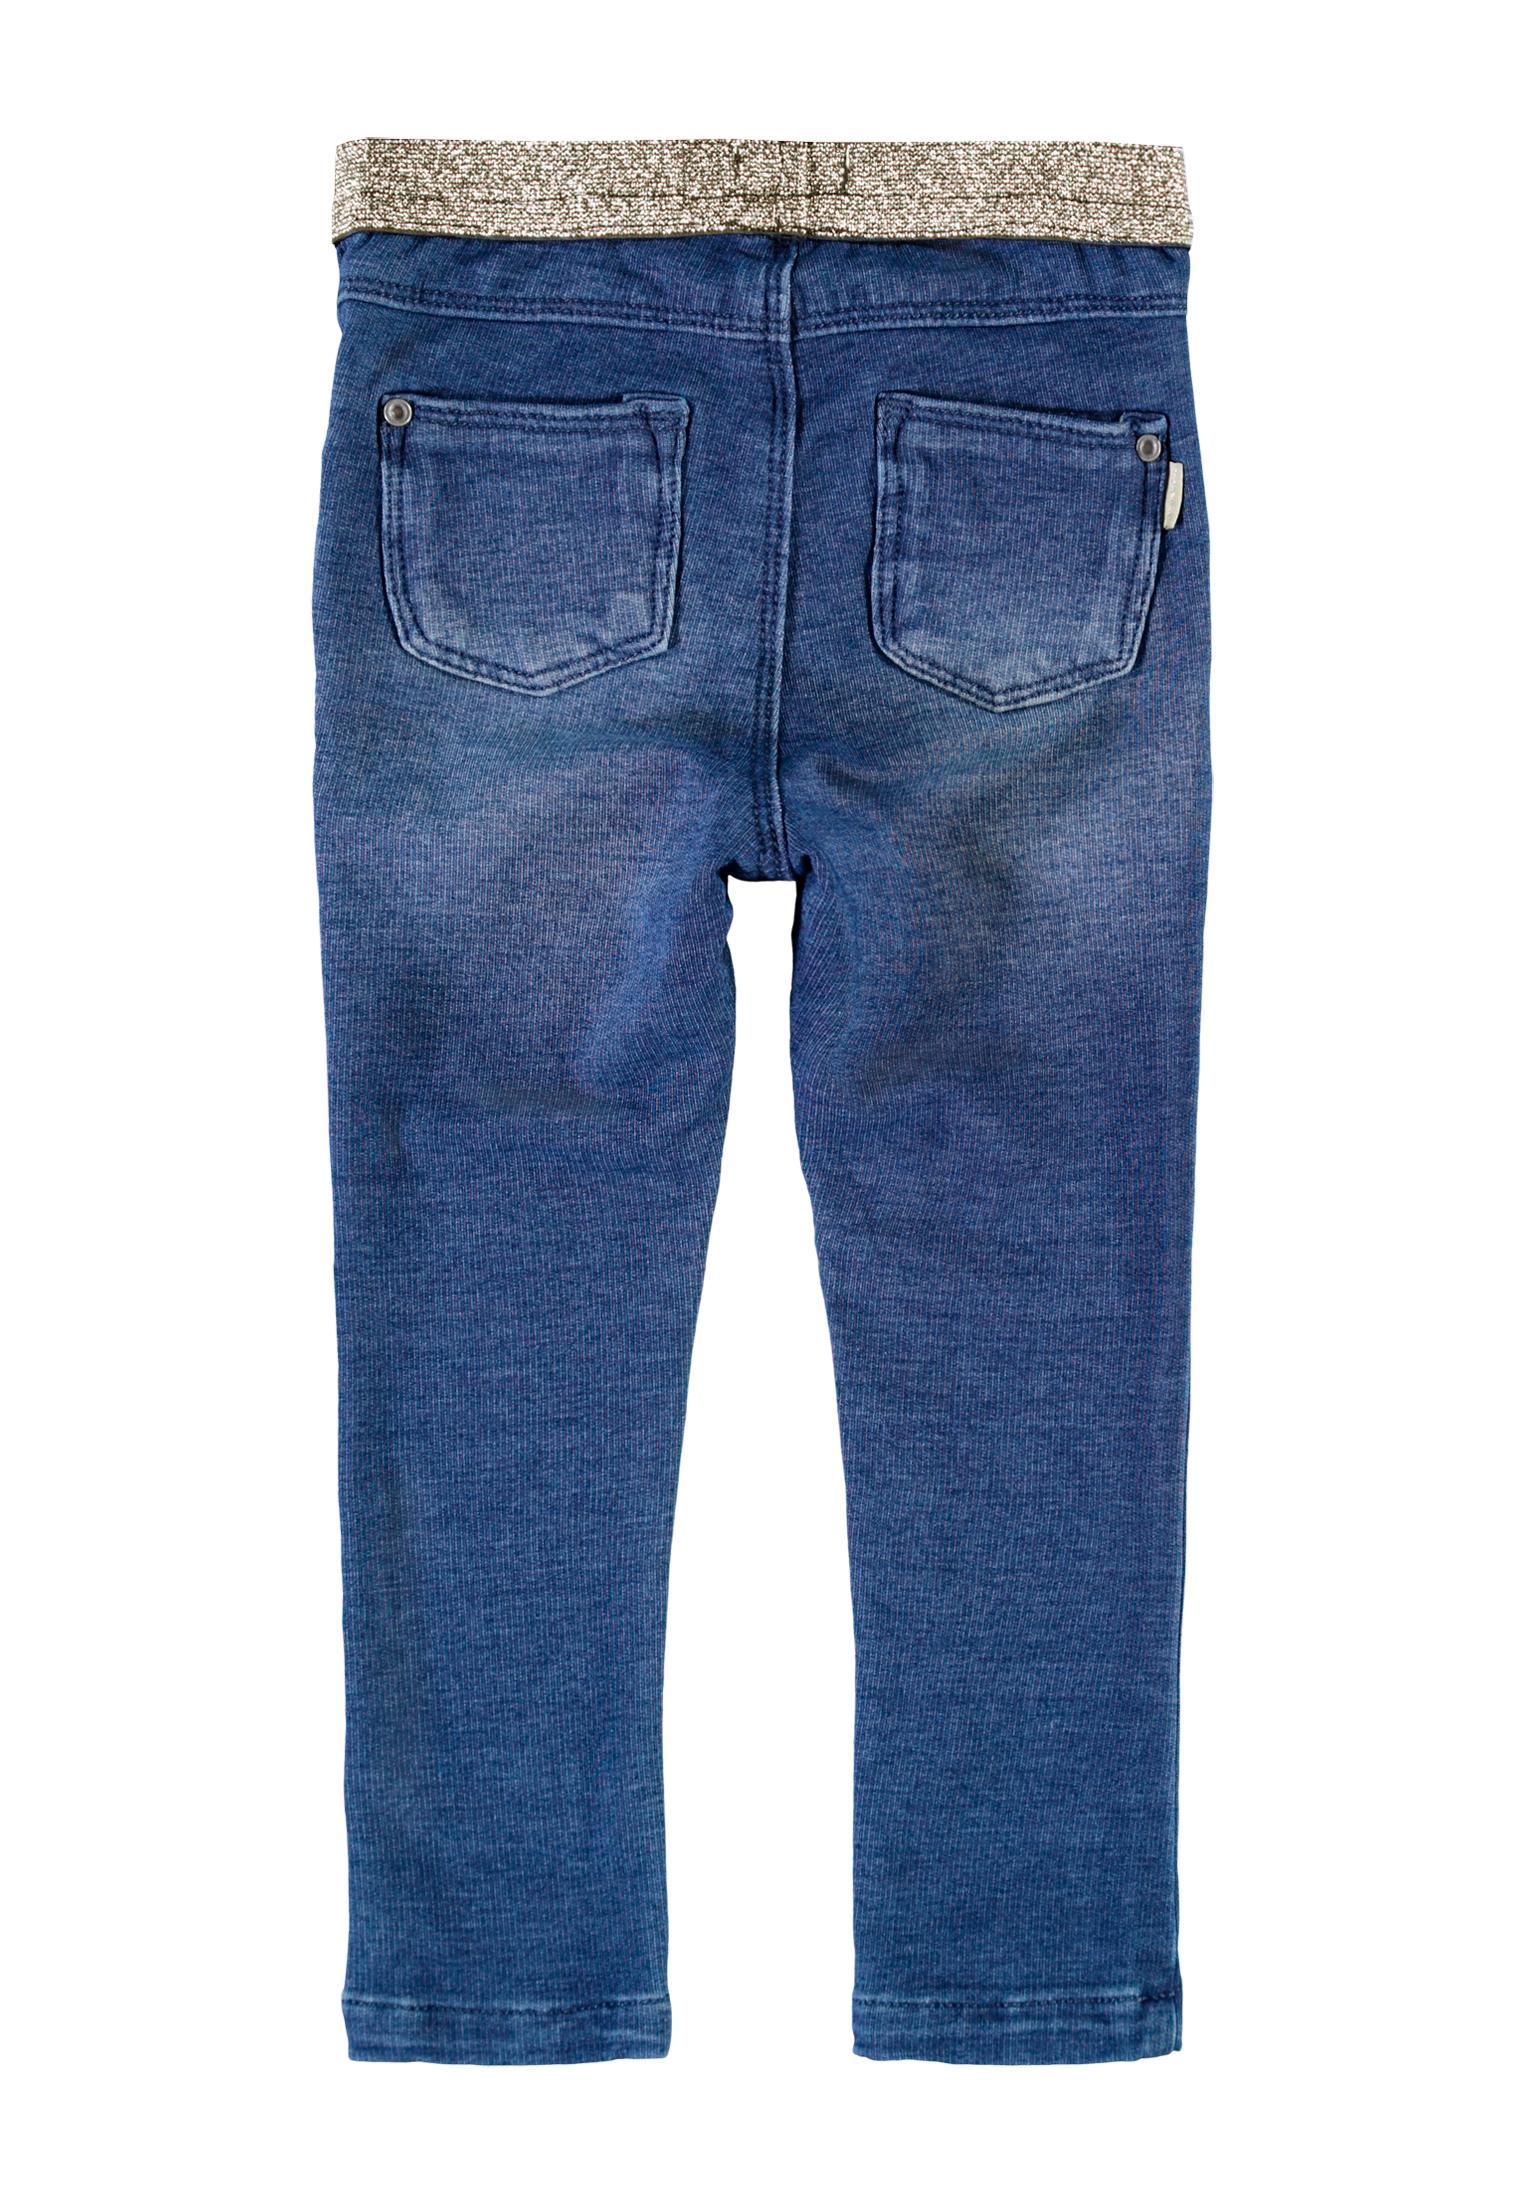 Name It Polly leggings, medium blue denim, 110